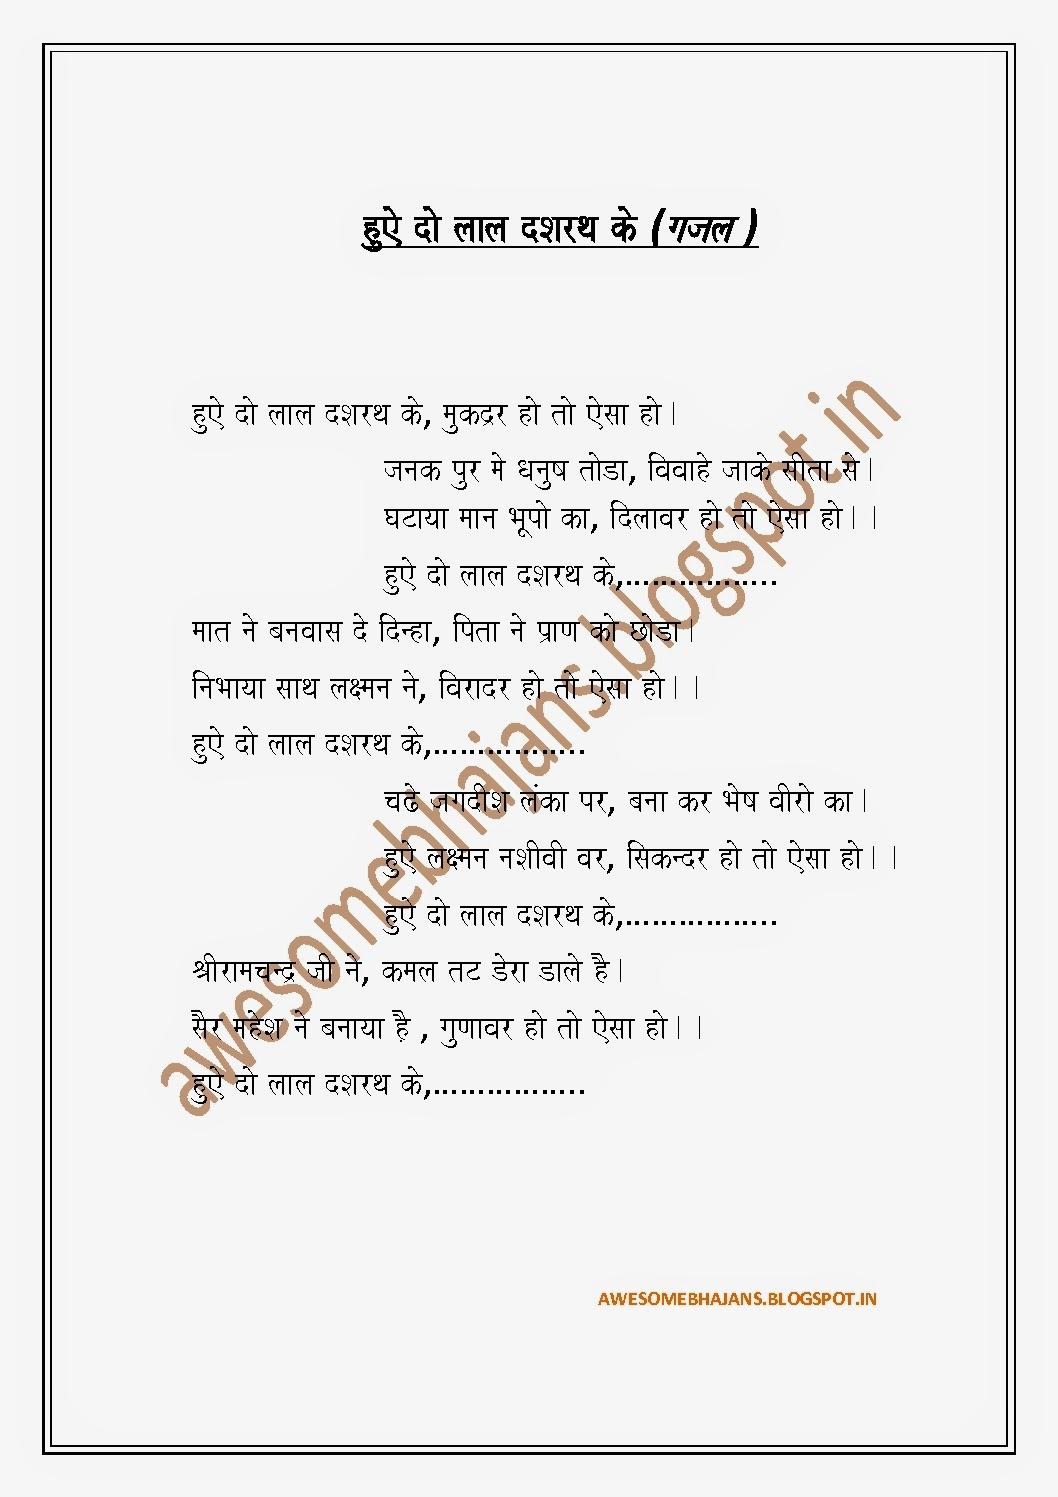 Awesome bhajans huye 2 huye 2 lal dasrath ke gajal thecheapjerseys Image collections